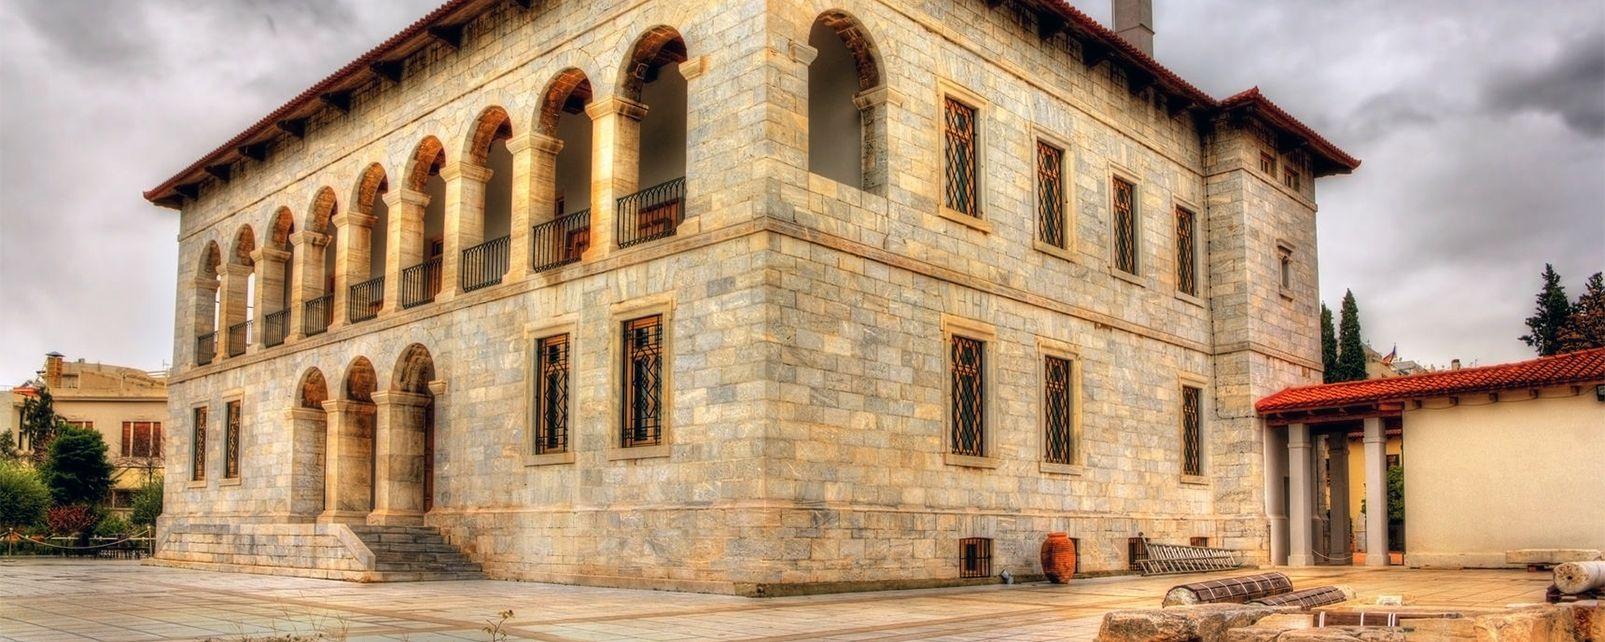 Le Musée byzantin , Grèce